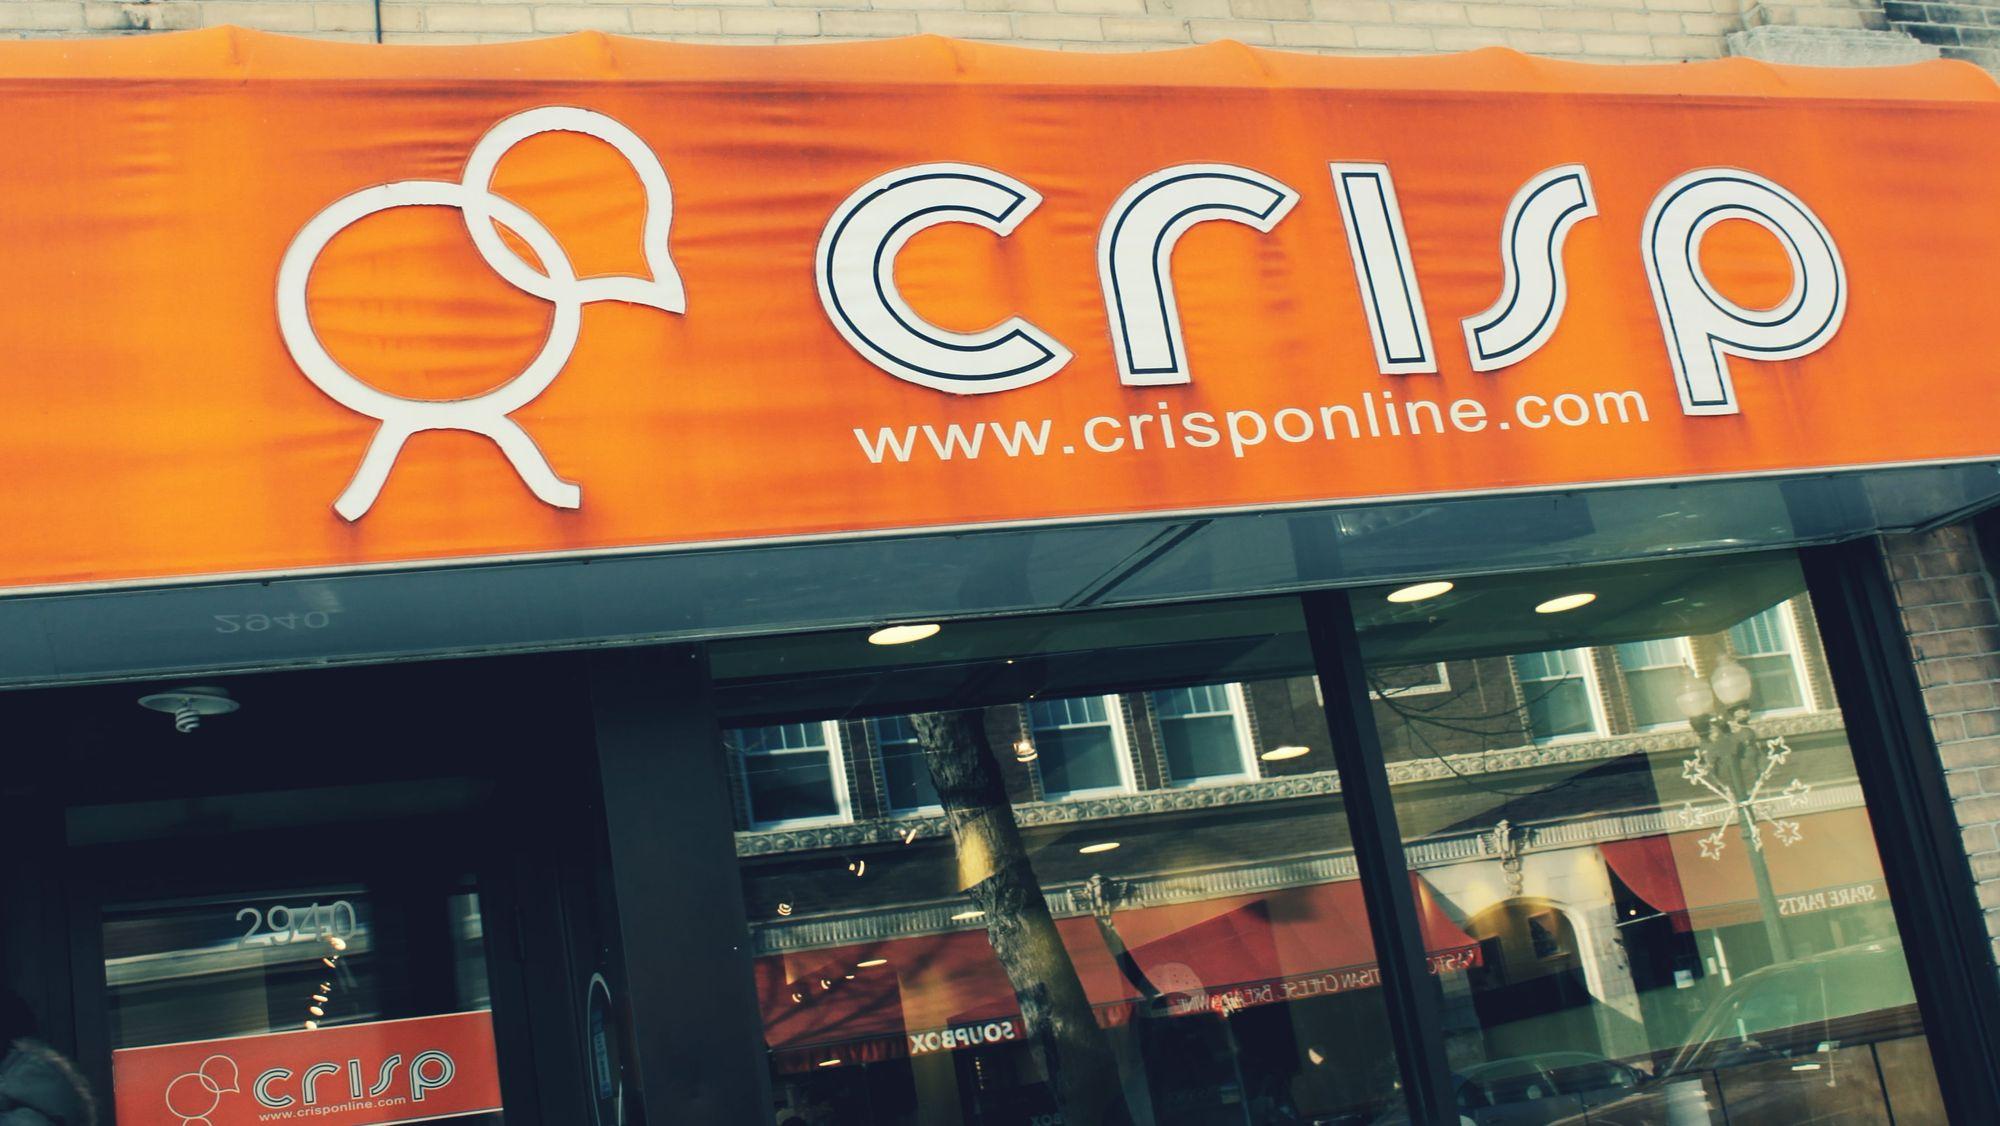 crisp chicken wings pixelwaves blog now boarding travel